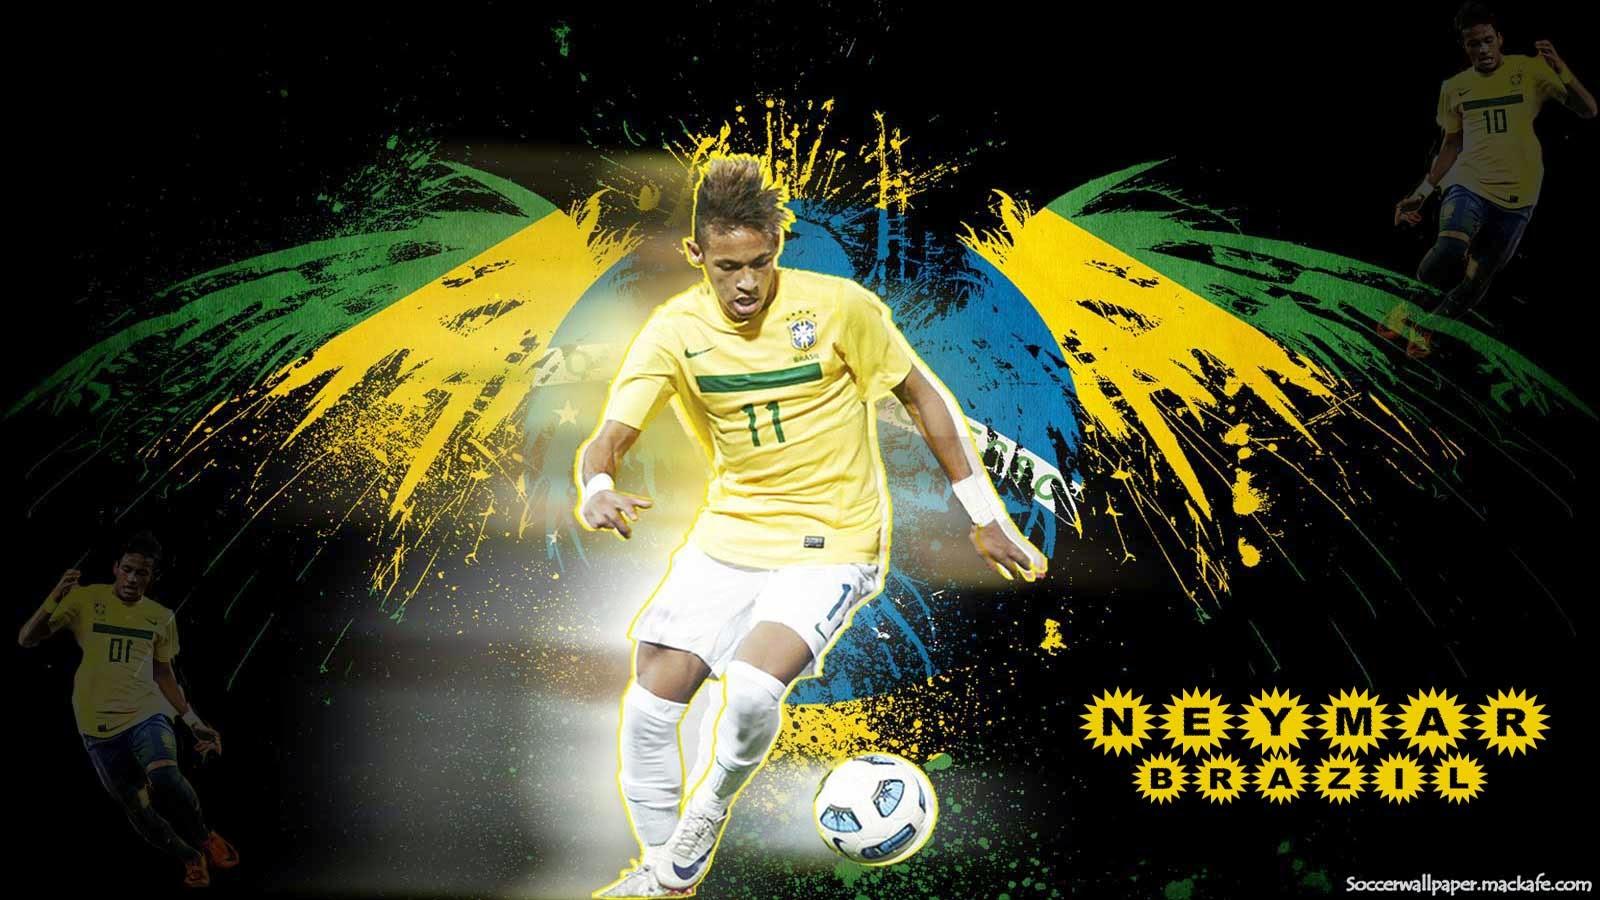 Neymar hd wallpapers 2015 brazil - Neymar brazil hd ...